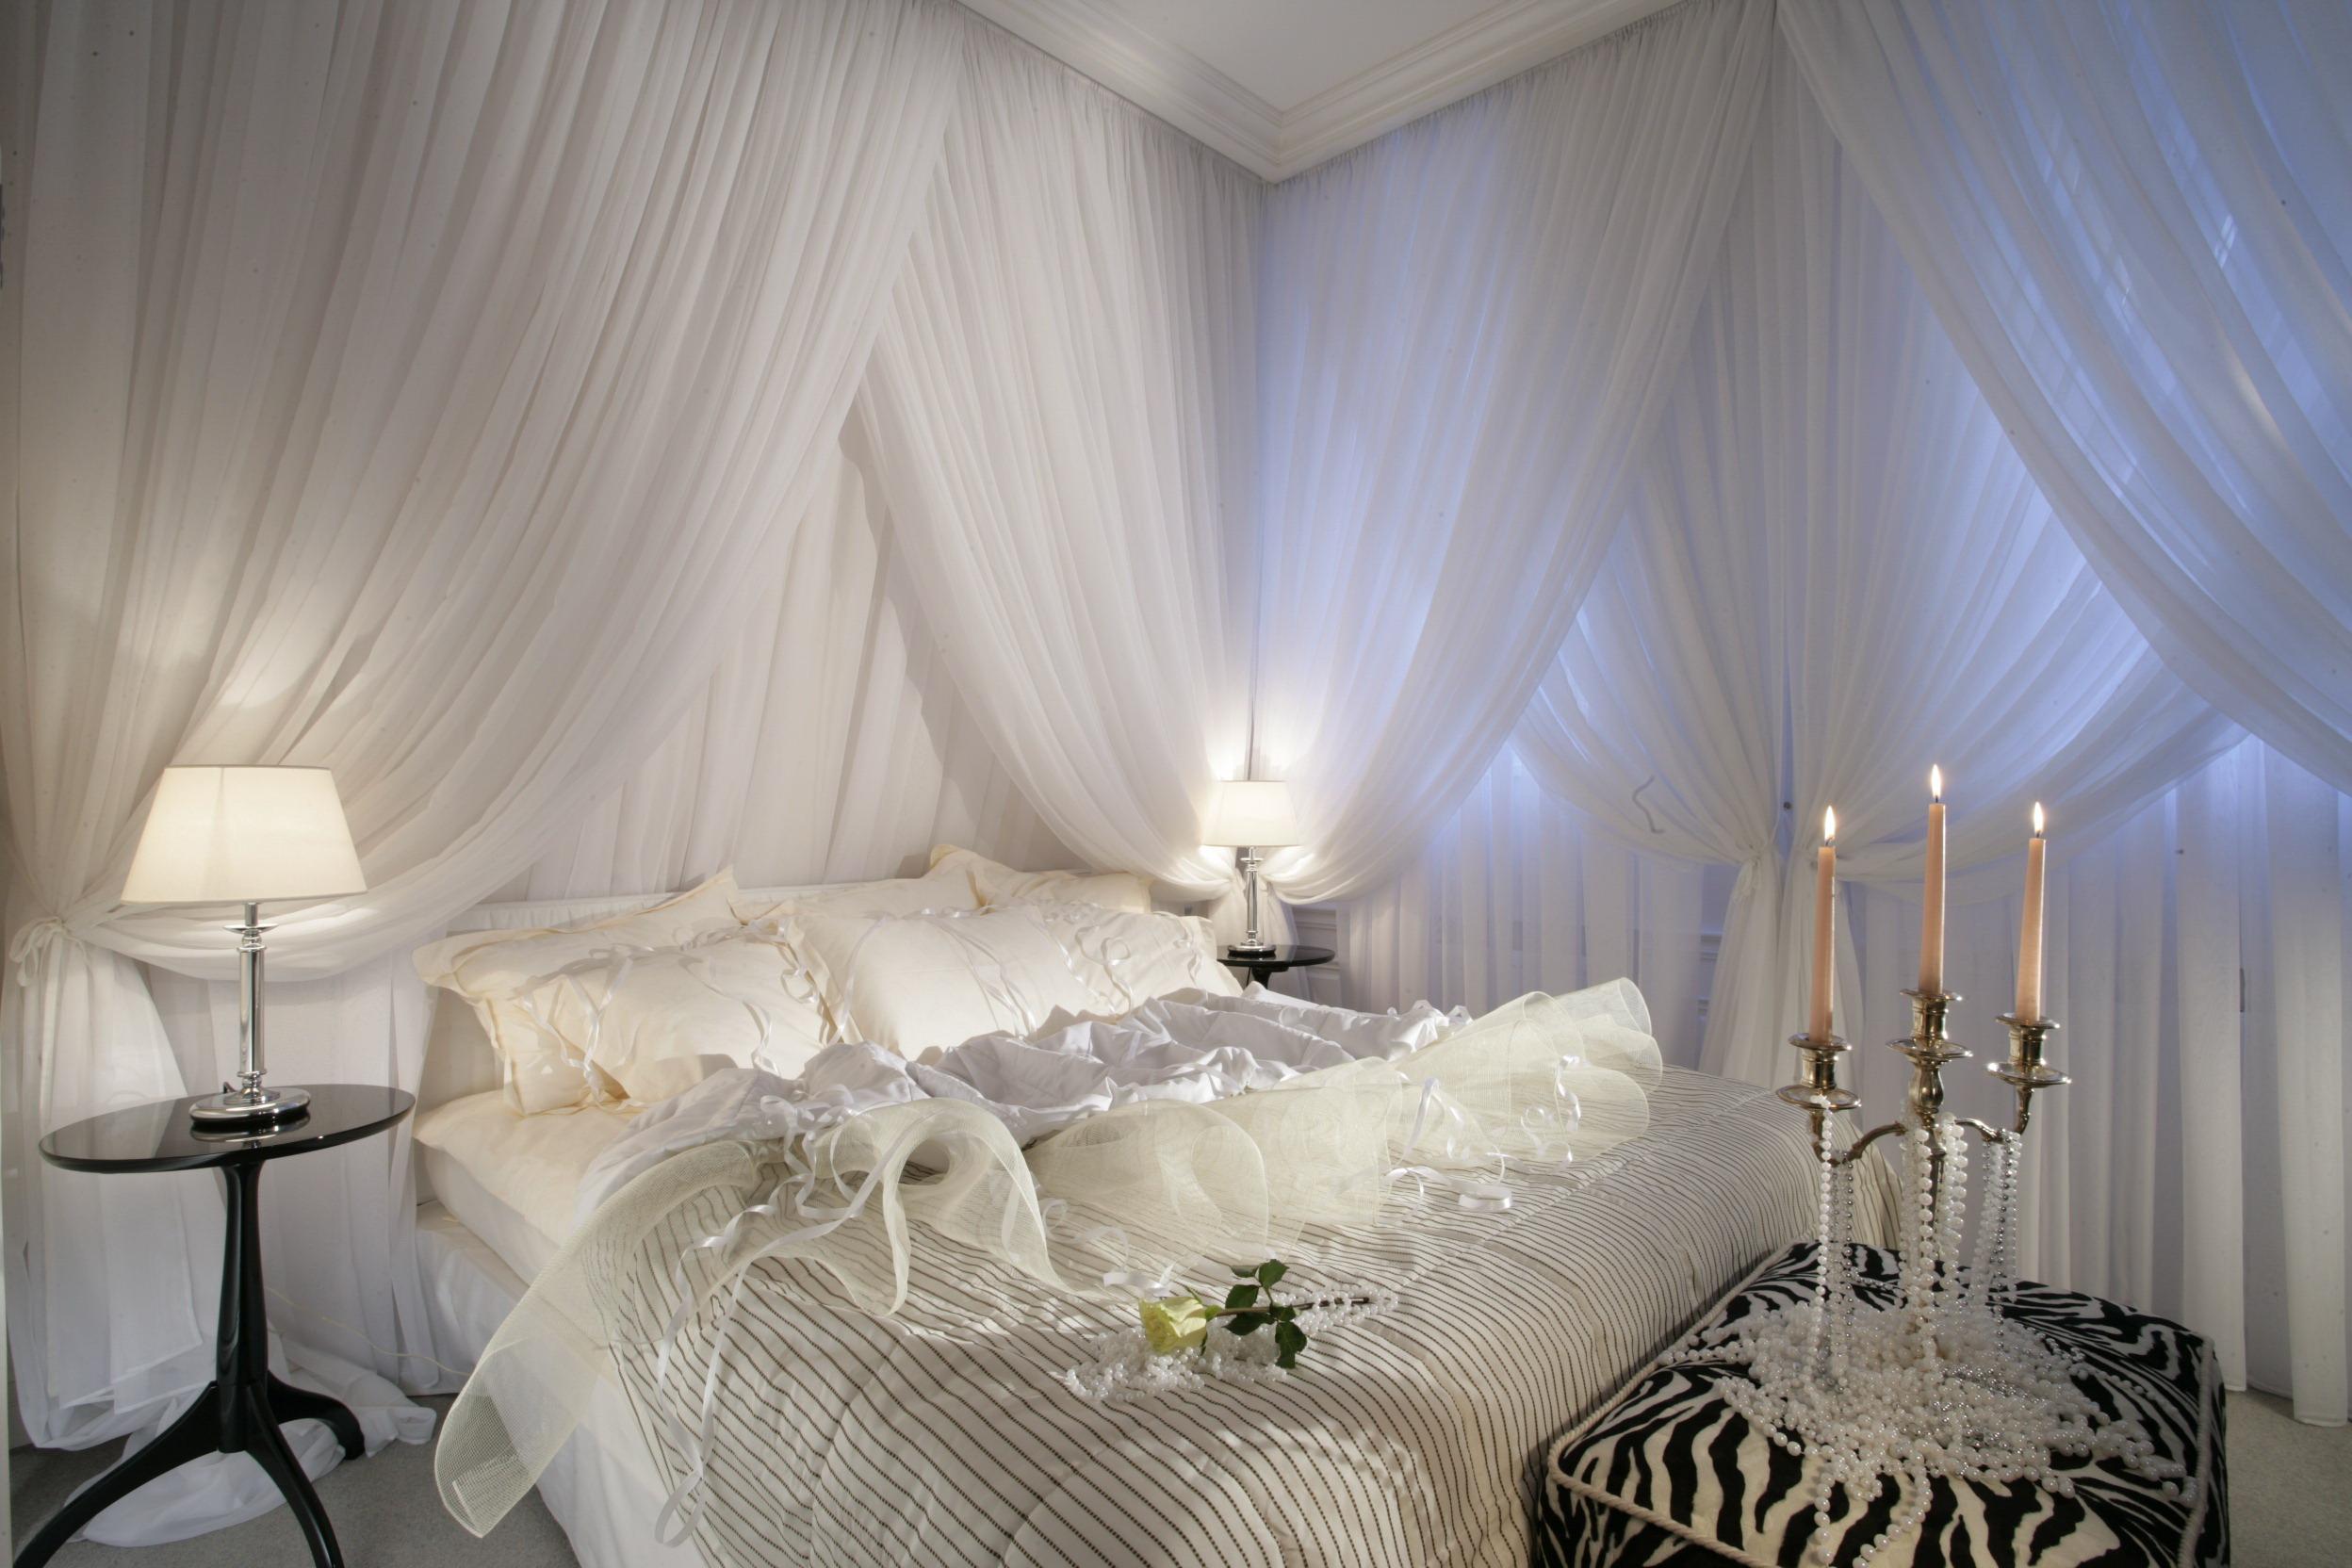 Luxury White Bedroom Ideas Modern Romantic Luxury Bedroom 2496x1664 Download Hd Wallpaper Wallpapertip